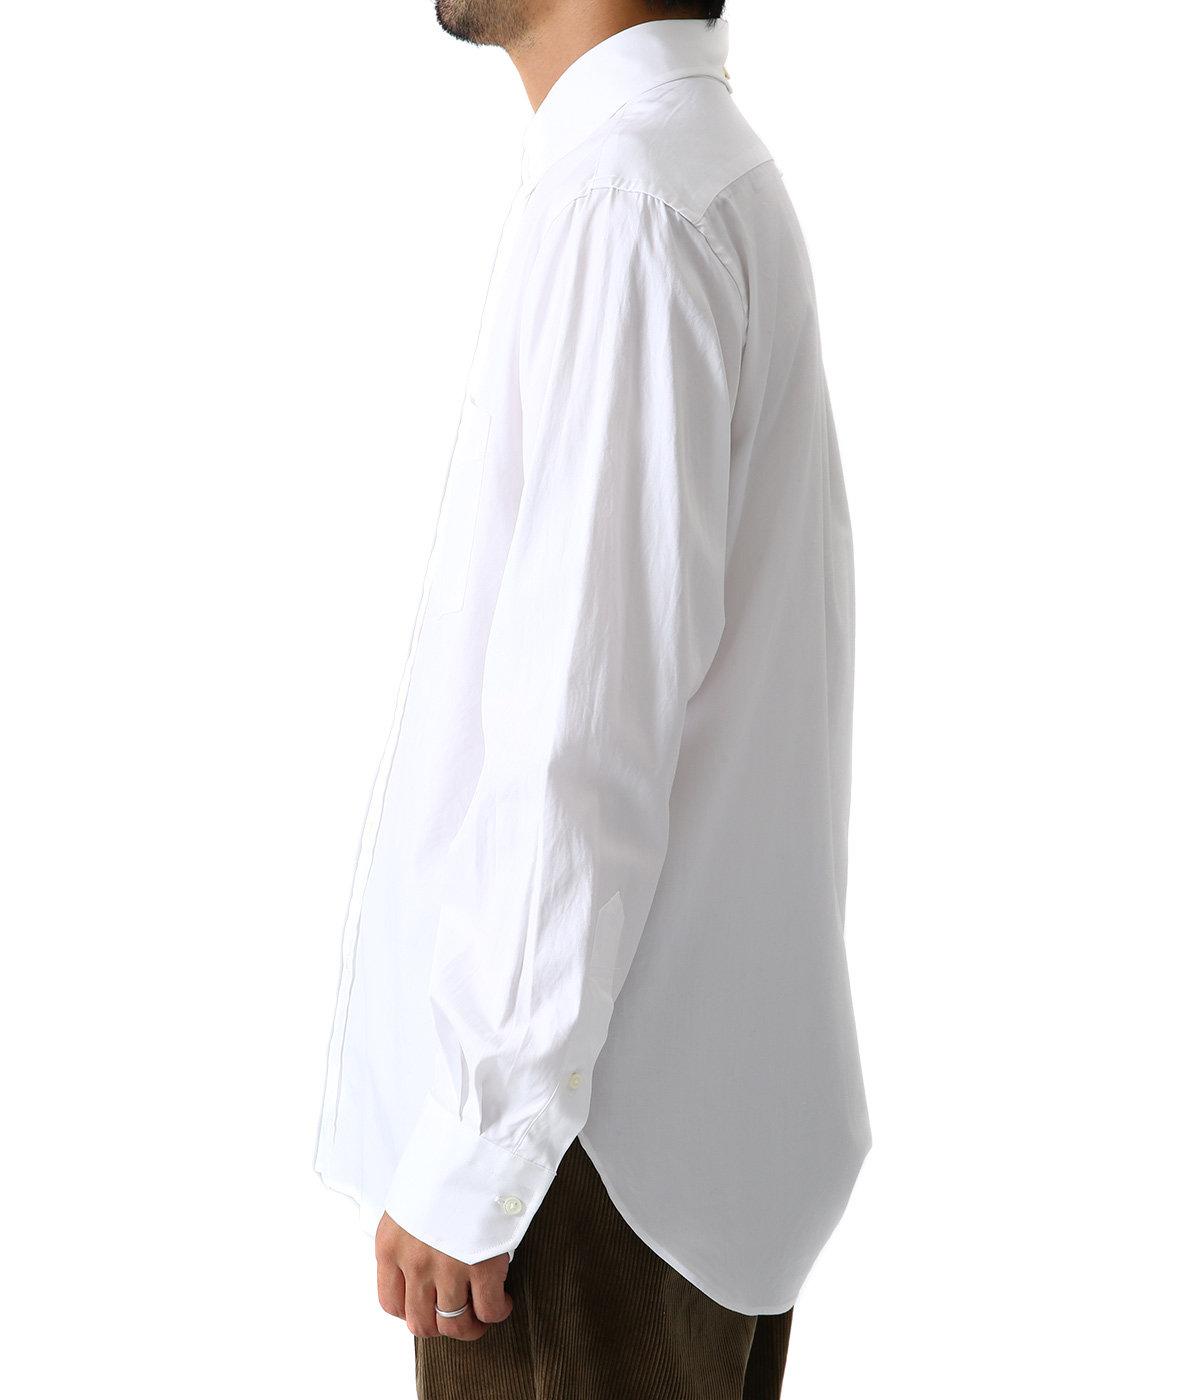 FINX Cotton Oxford B.D Collar Shirt